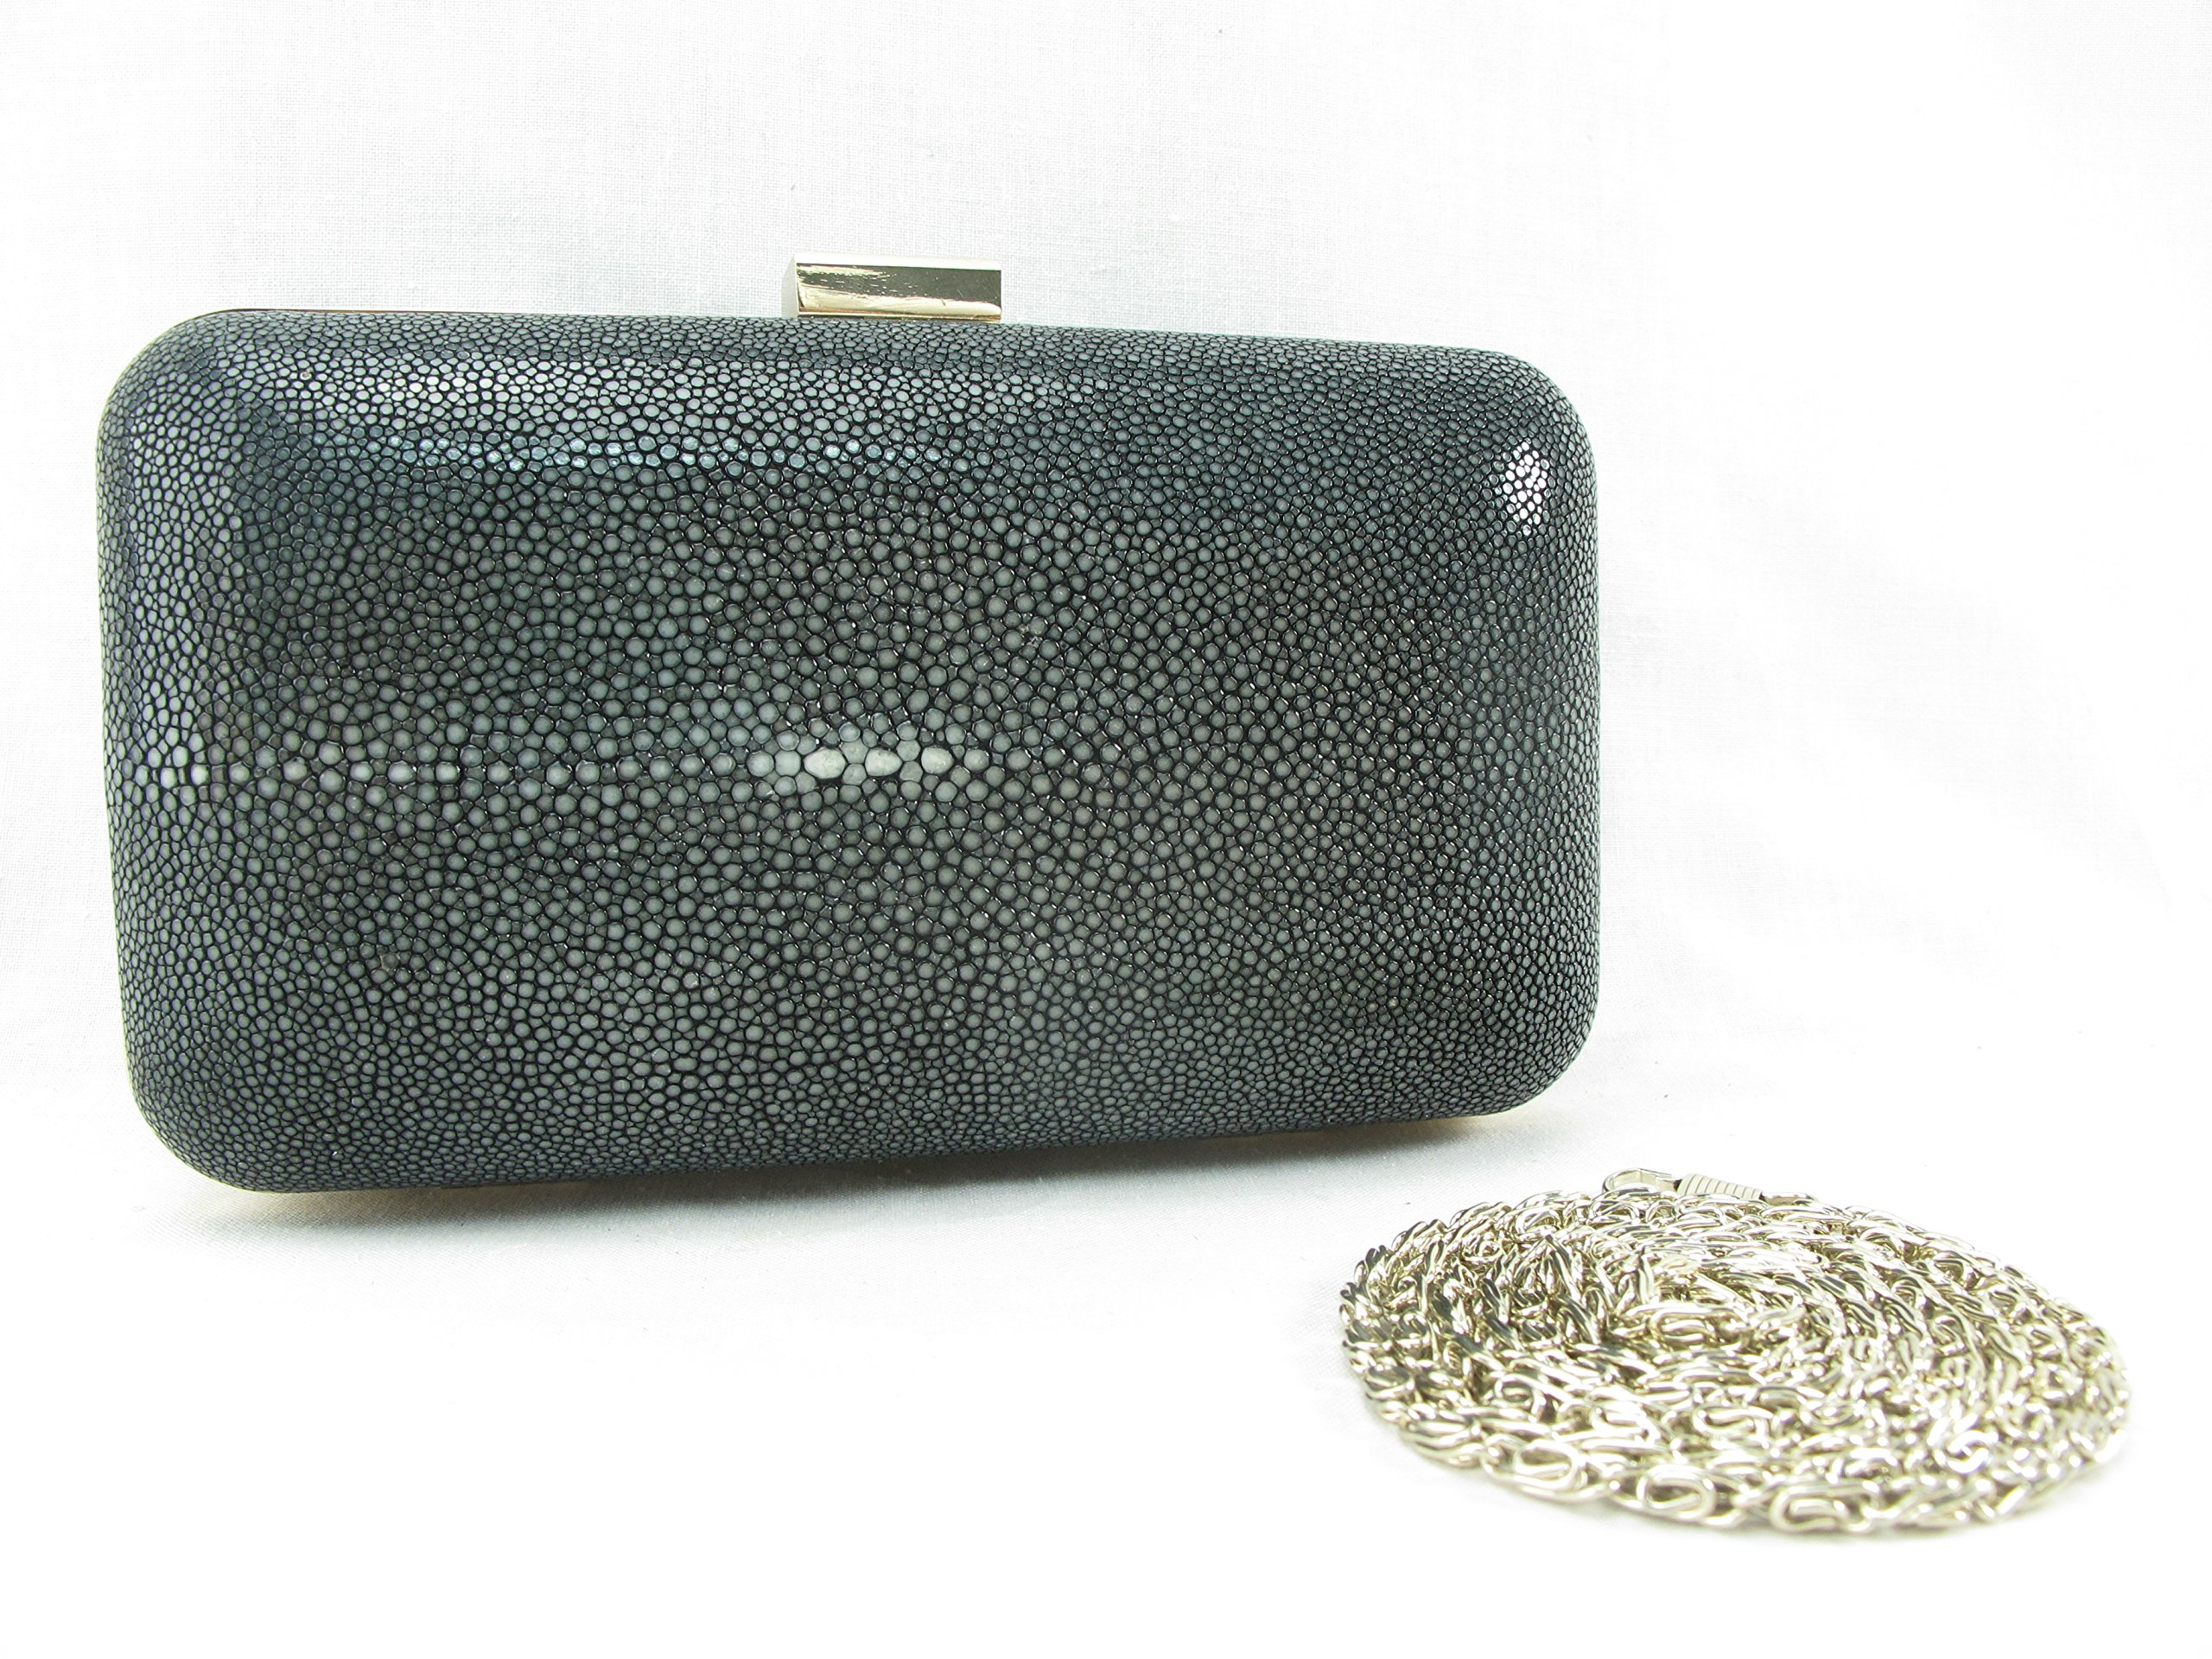 PELGIO Genuine Stingray Skin Leather Women Evening Clutch Shoulder Box Bag (Black)